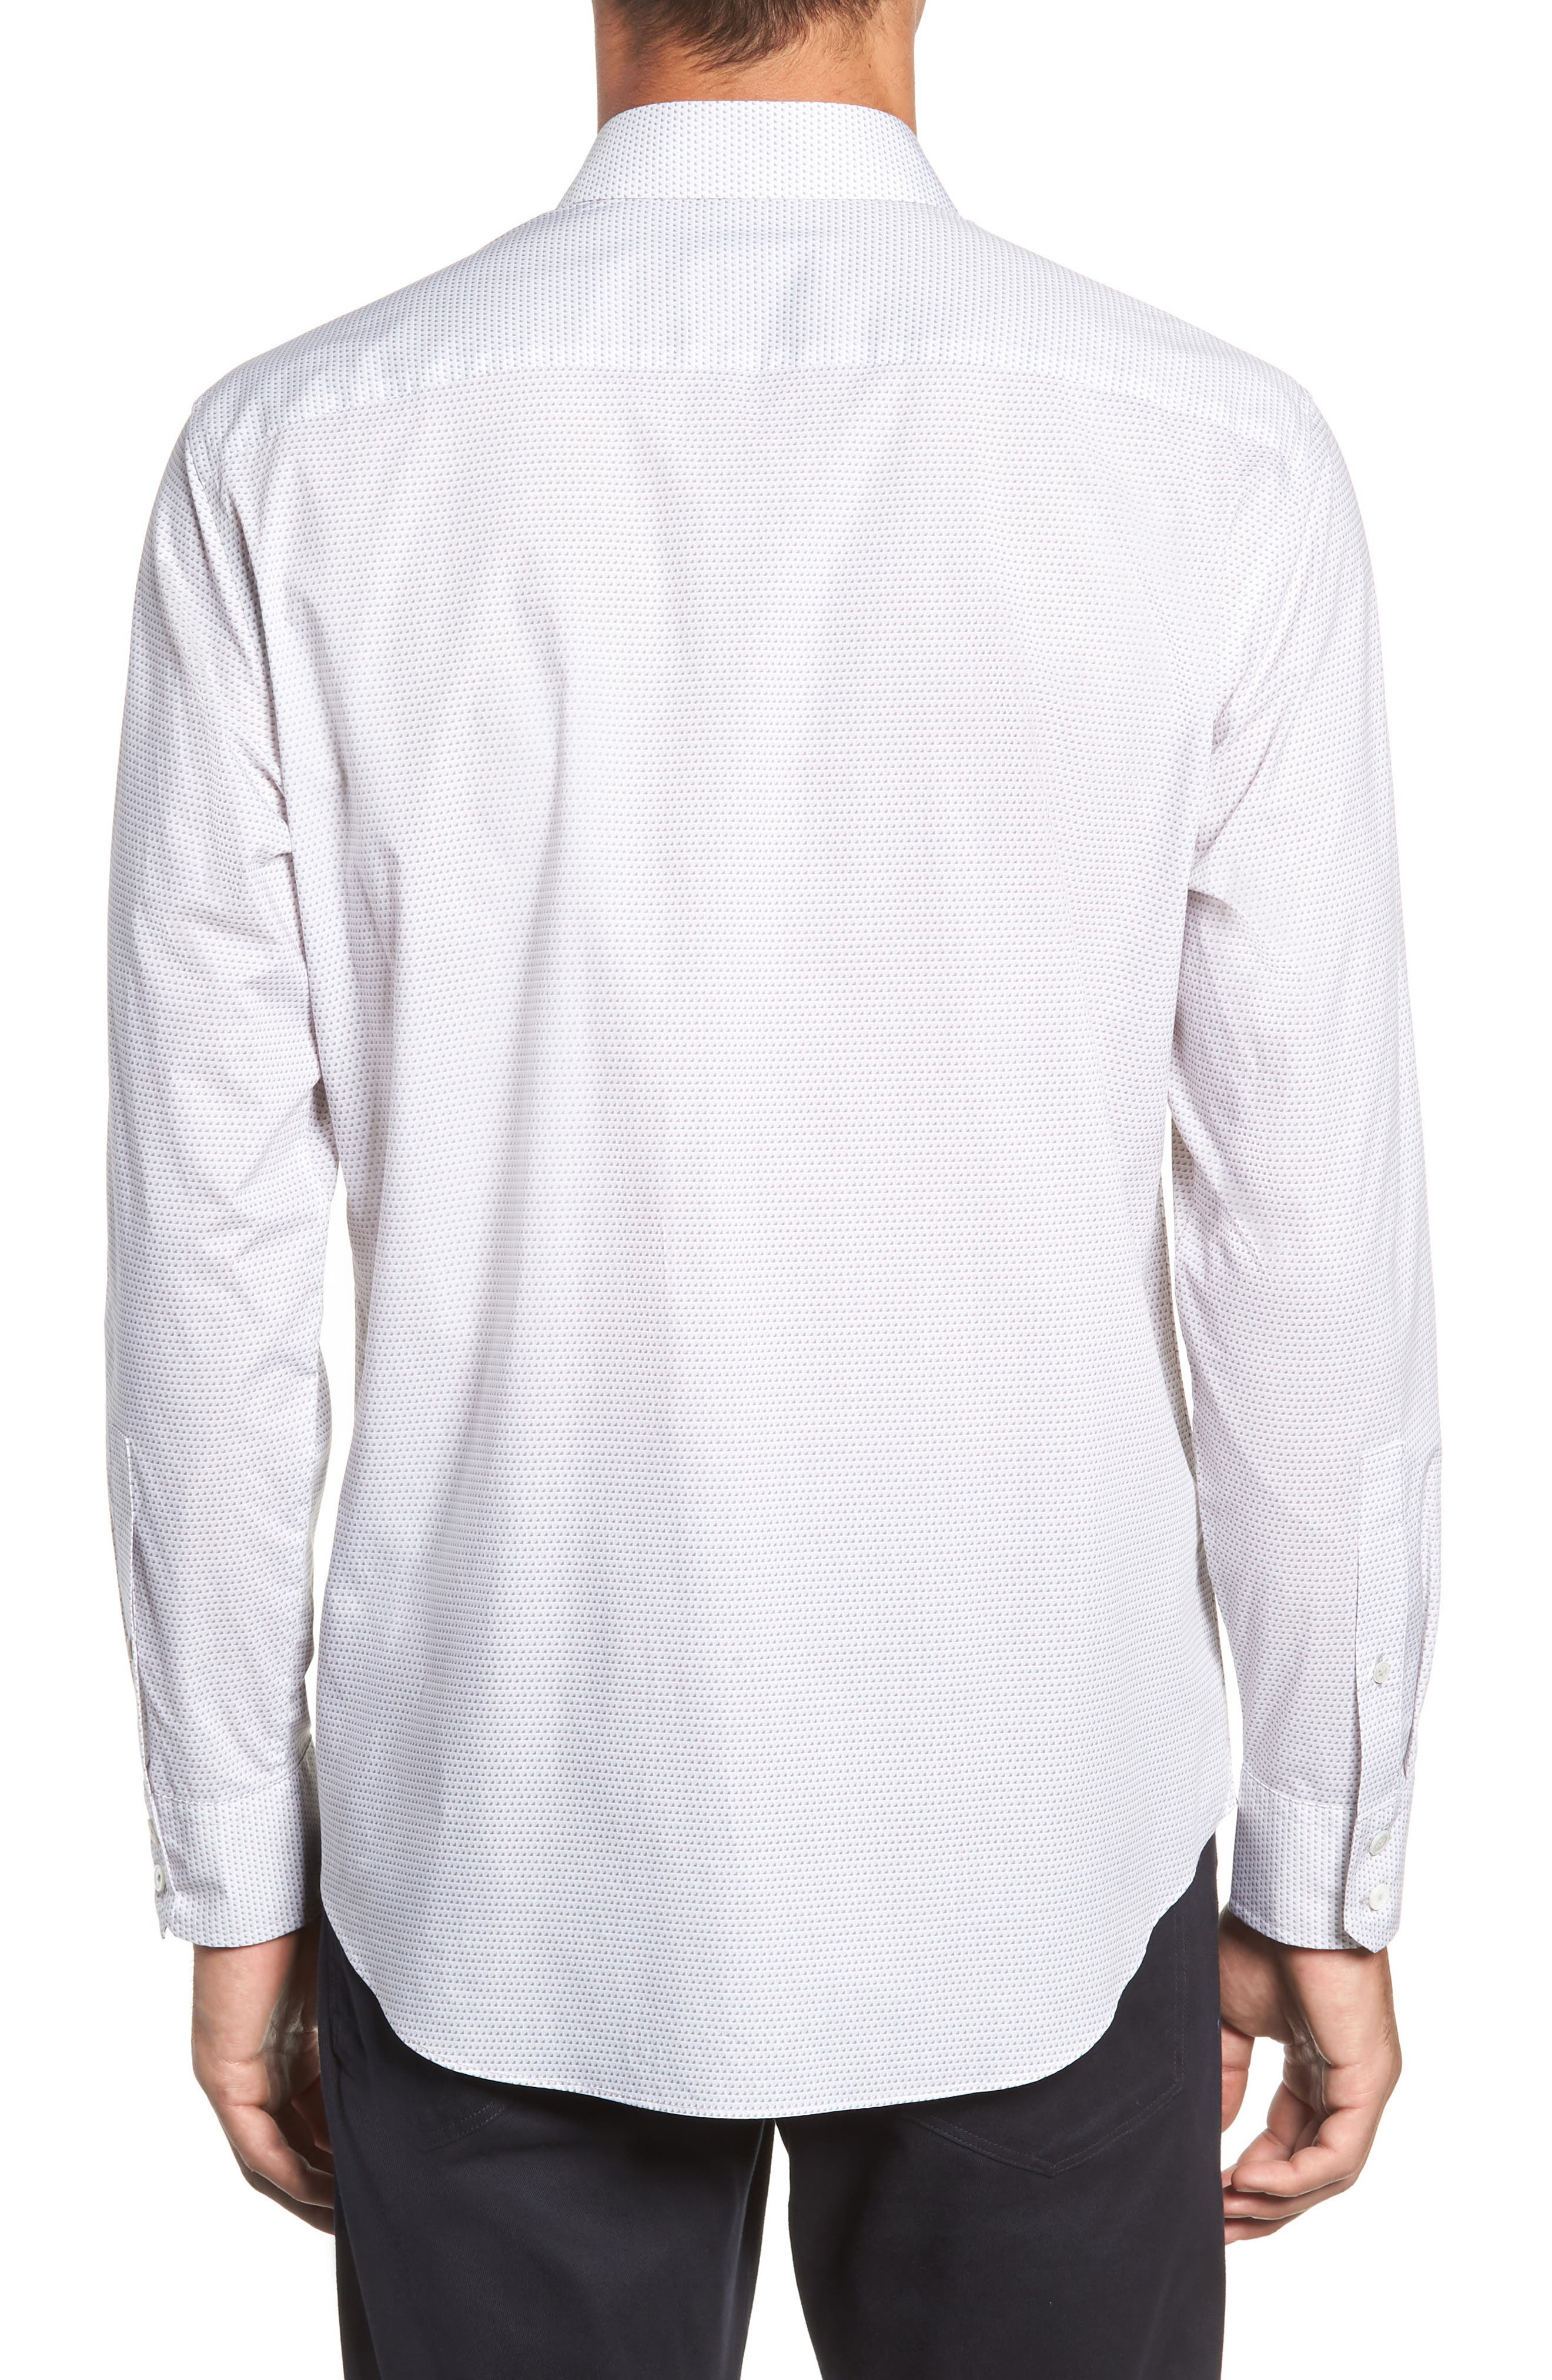 Toledo Regular Fit Microdot Sport Shirt,                             Alternate thumbnail 3, color,                             WHITE